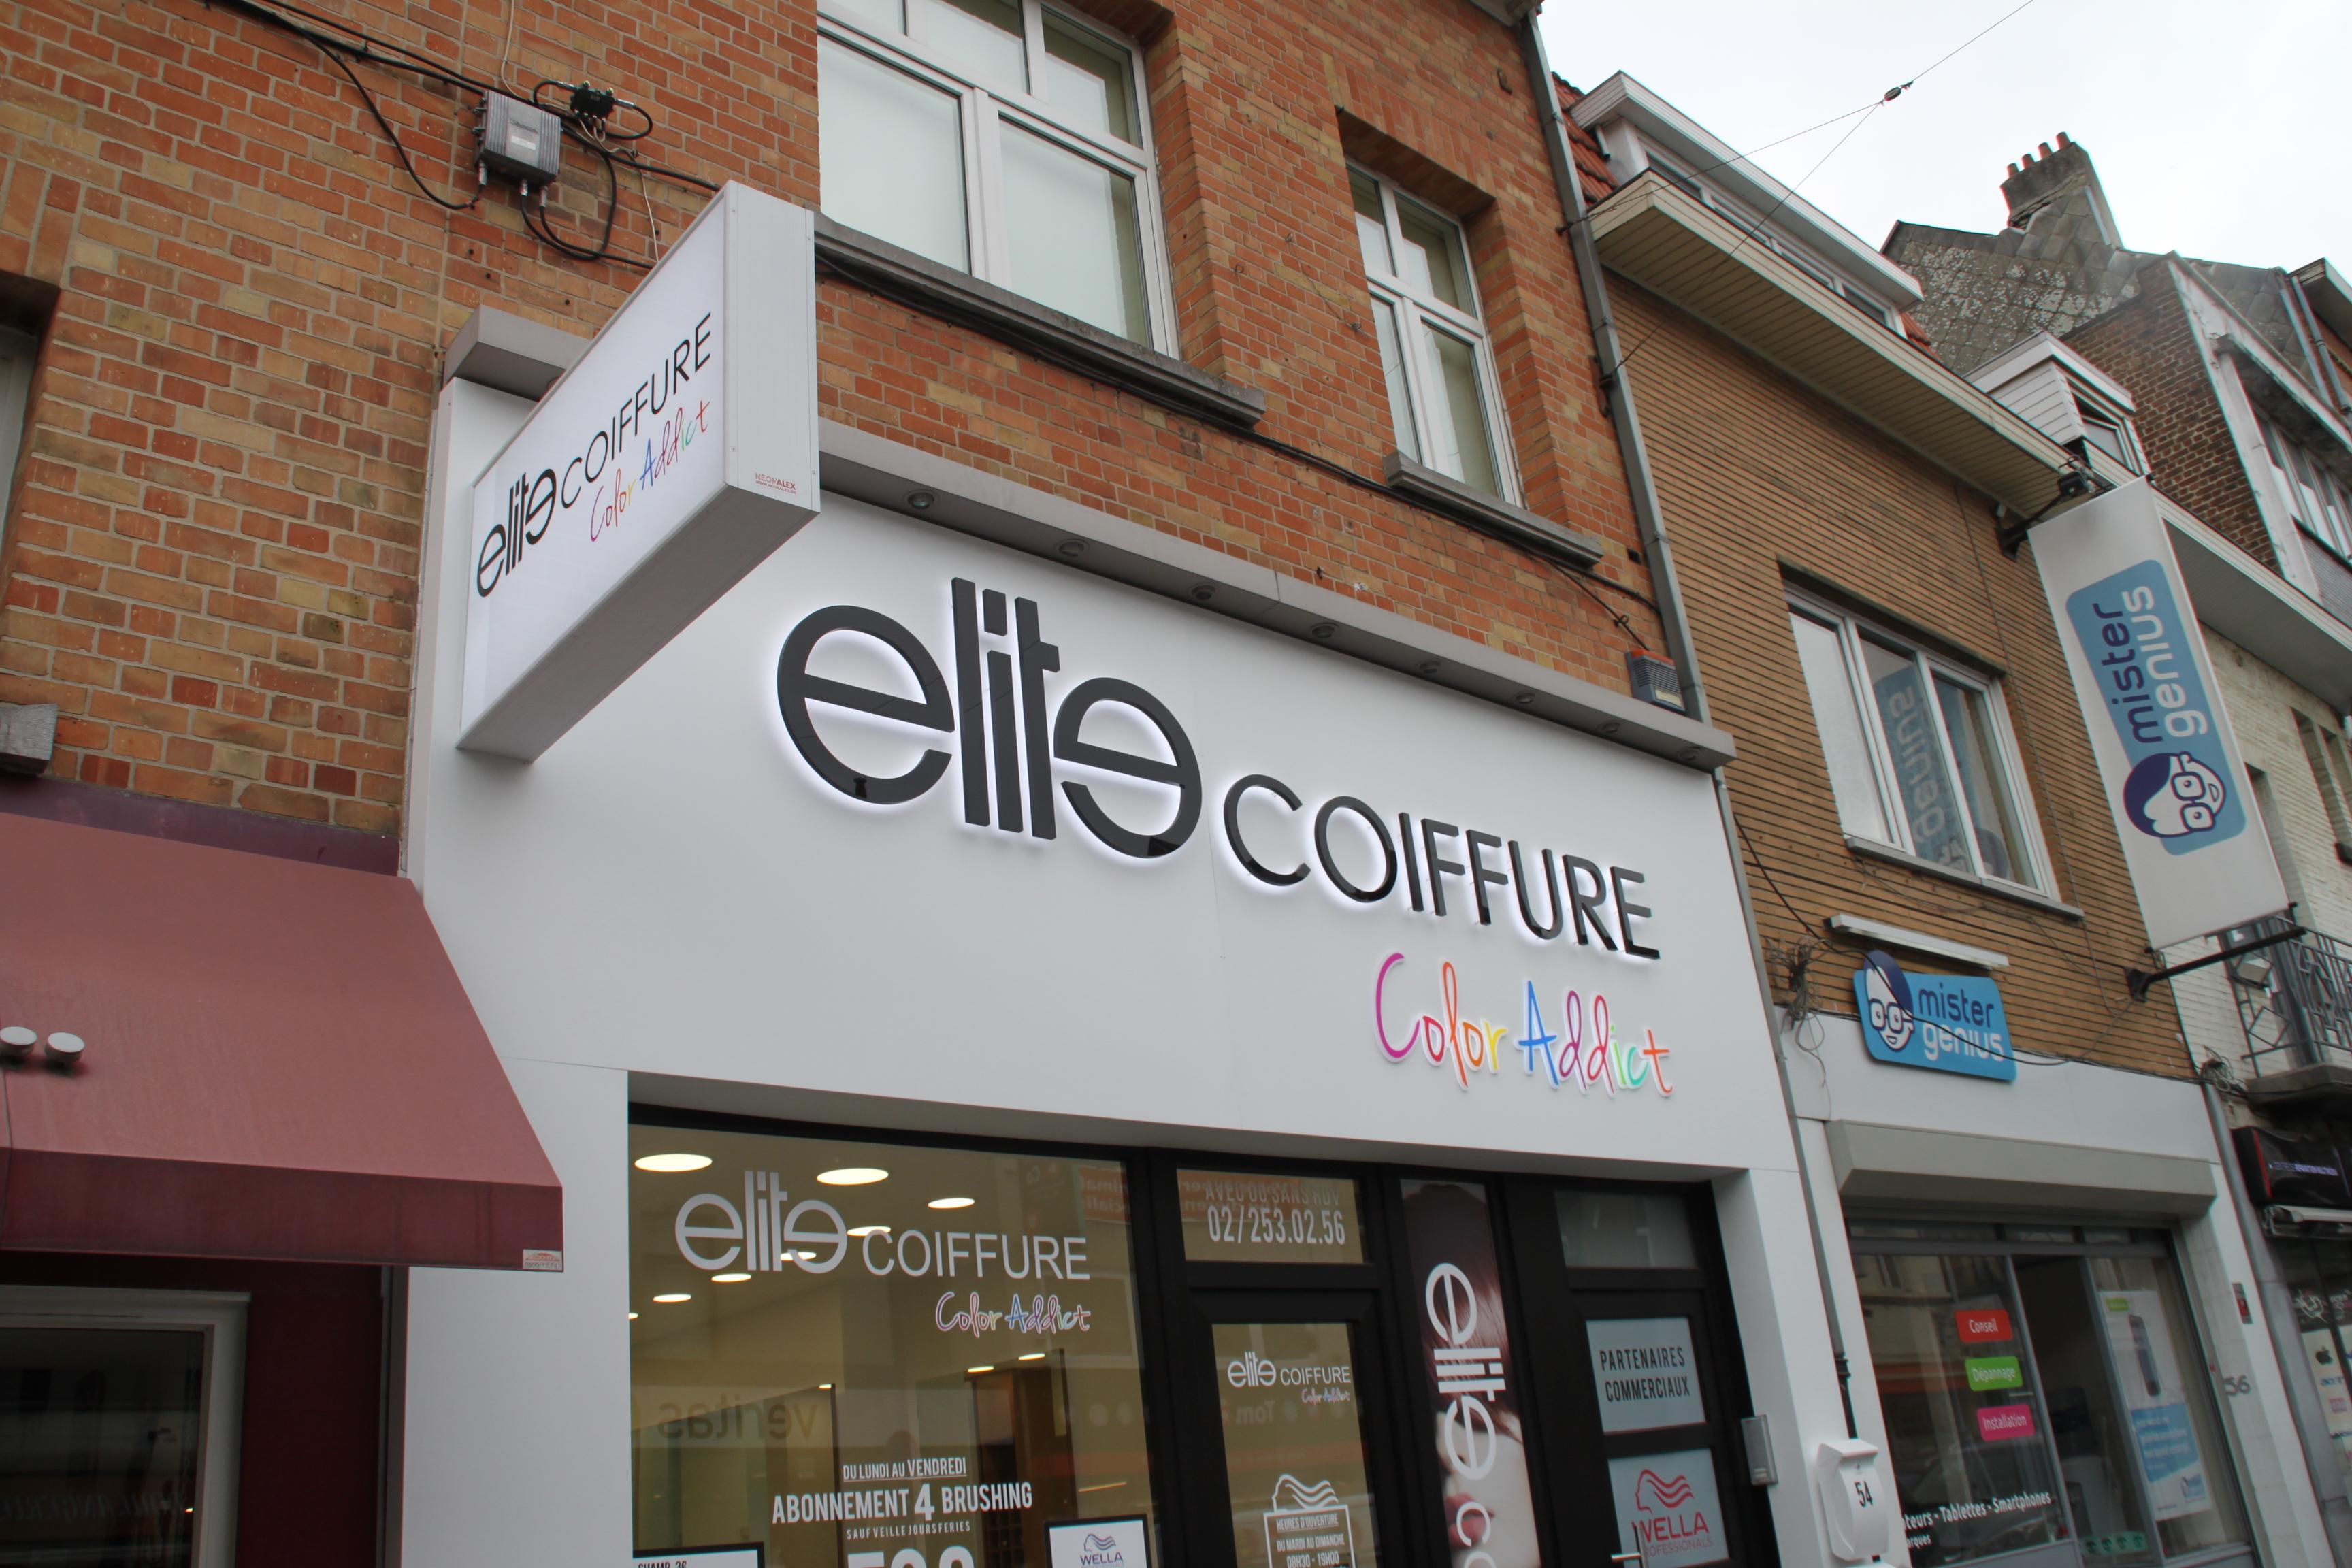 Lettres en relief Elite coiffure Bruxelles